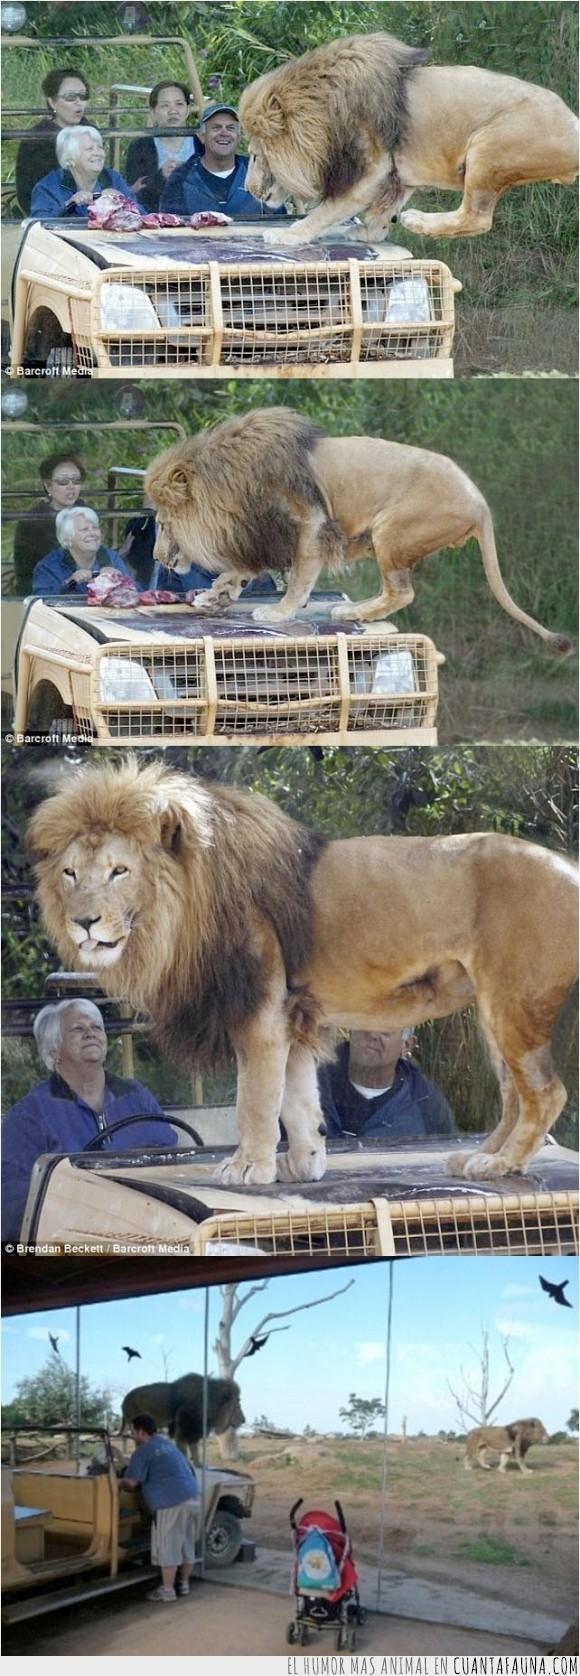 leon,Melbourne,realismo,Werribee zoo,zafarí,zoologico